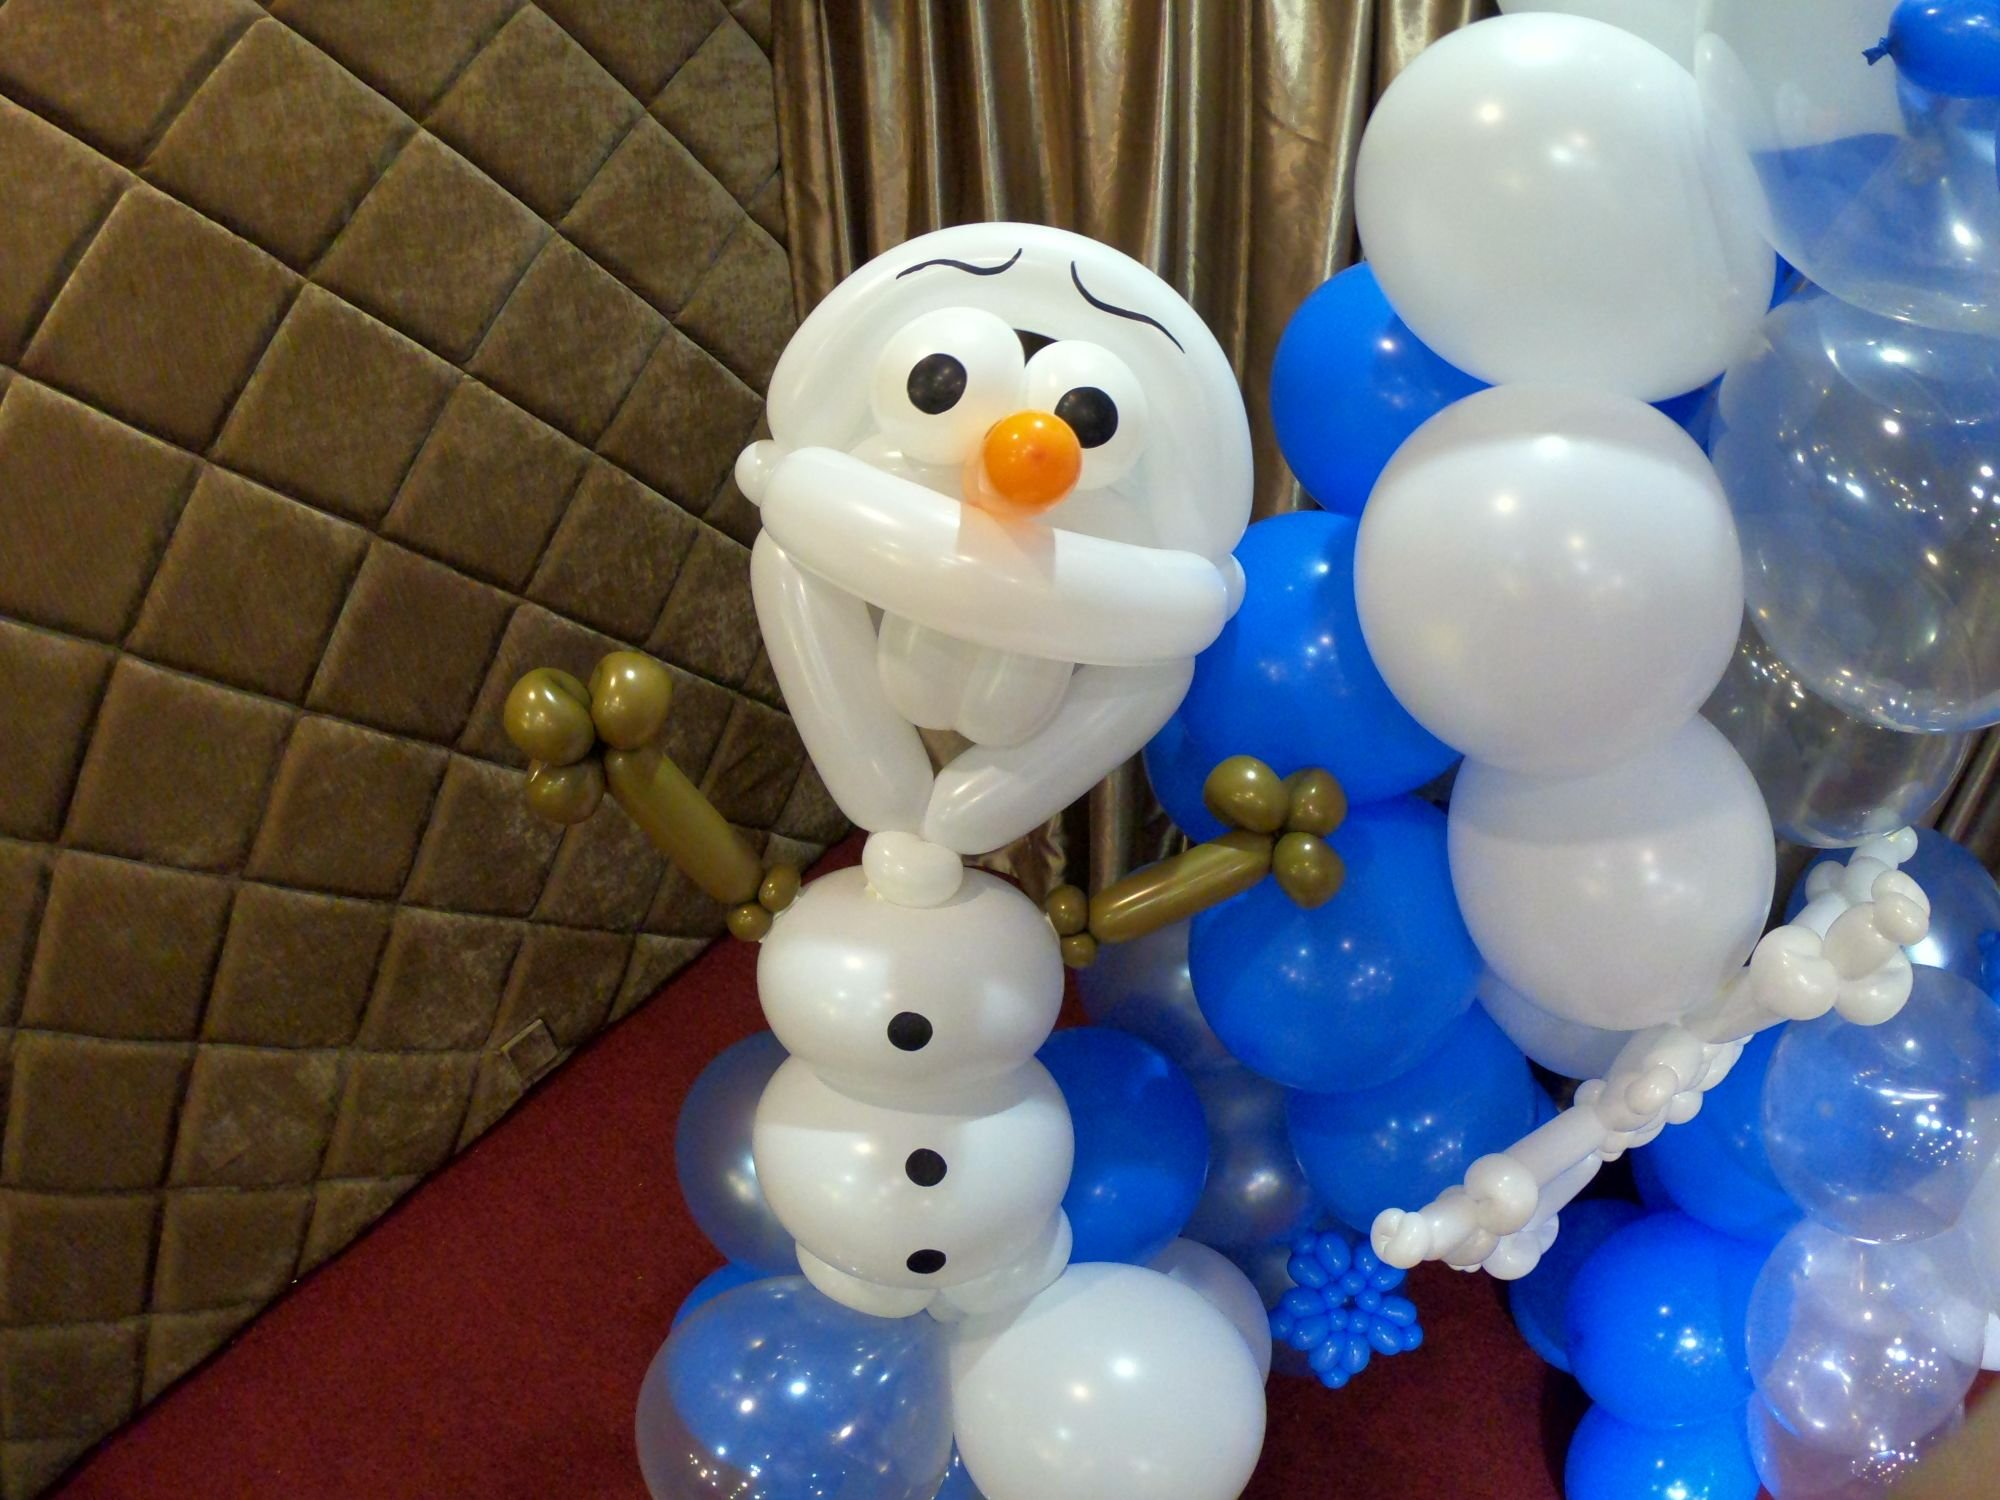 , Frozen Theme Balloon Decorations, Singapore Balloon Decoration Services - Balloon Workshop and Balloon Sculpting